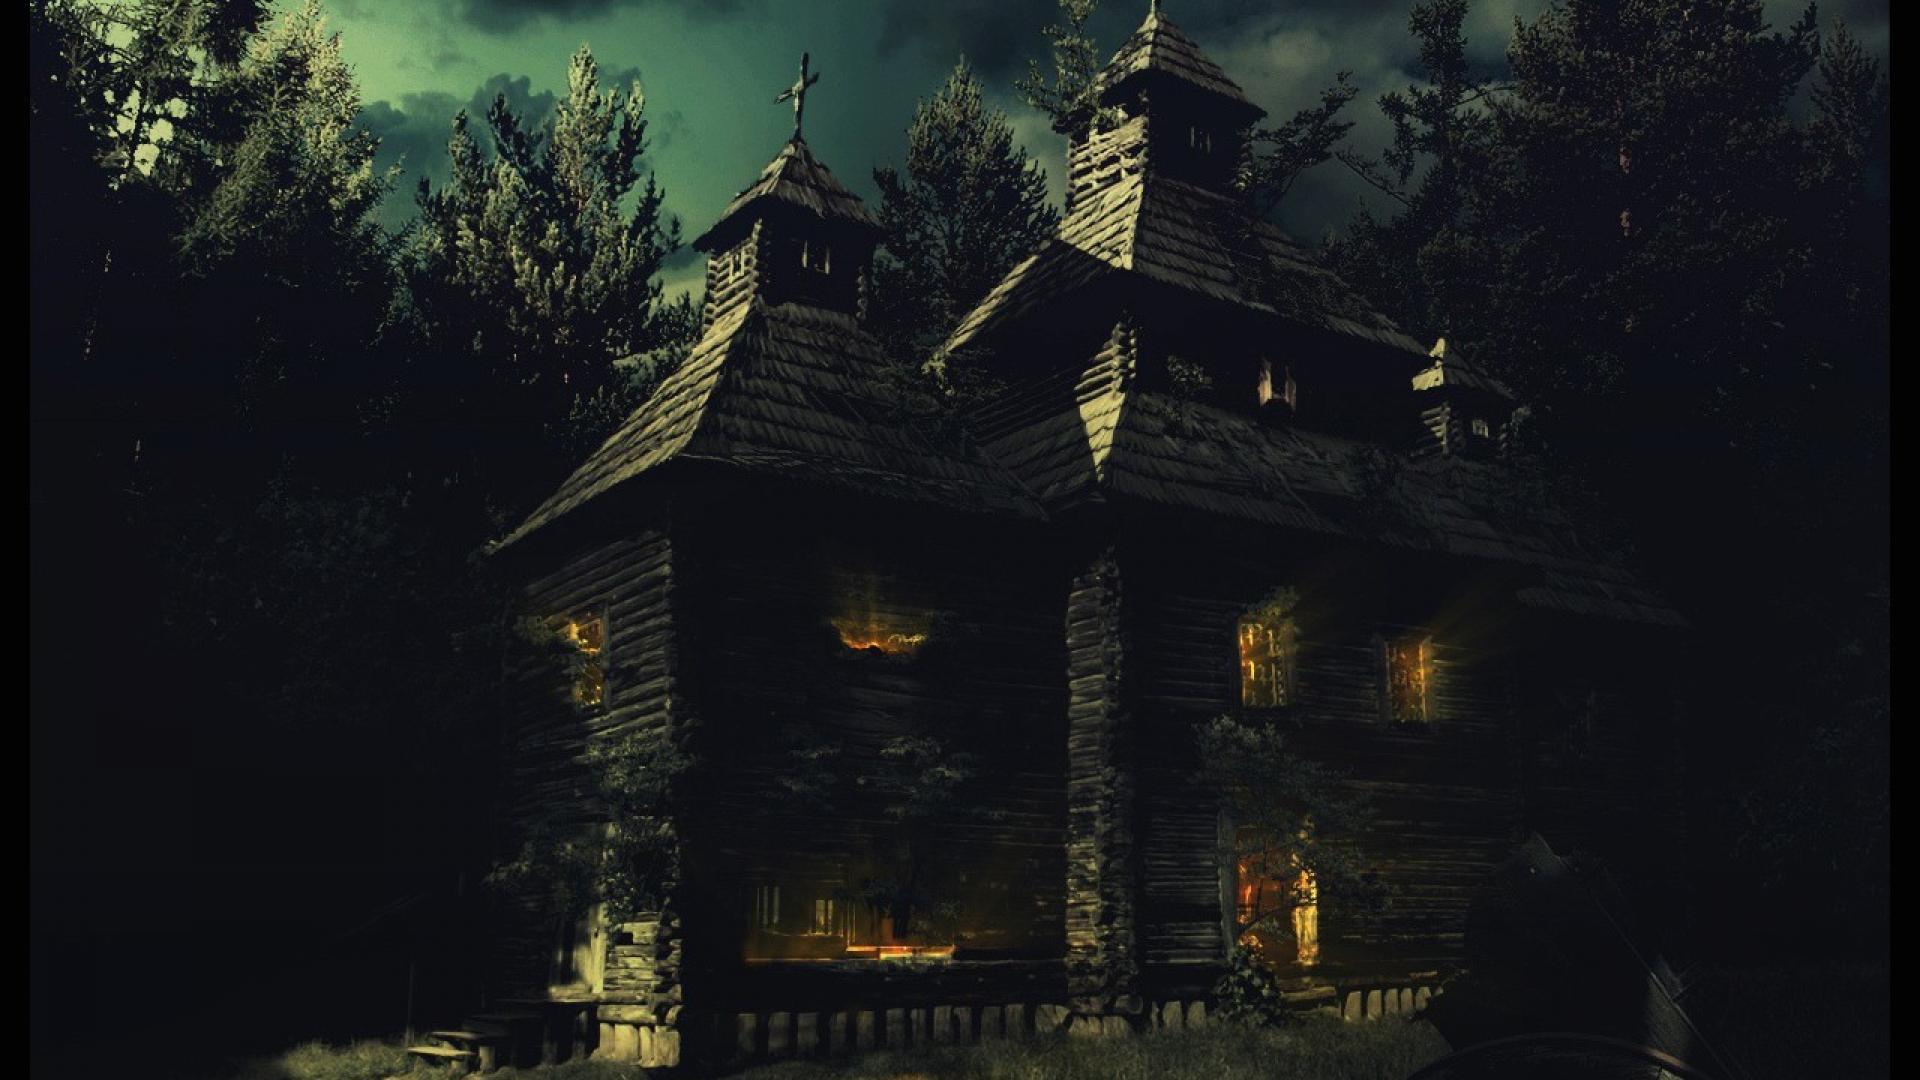 Haunted house wallpaper desktop wallpapersafari for Wallpaper with houses on